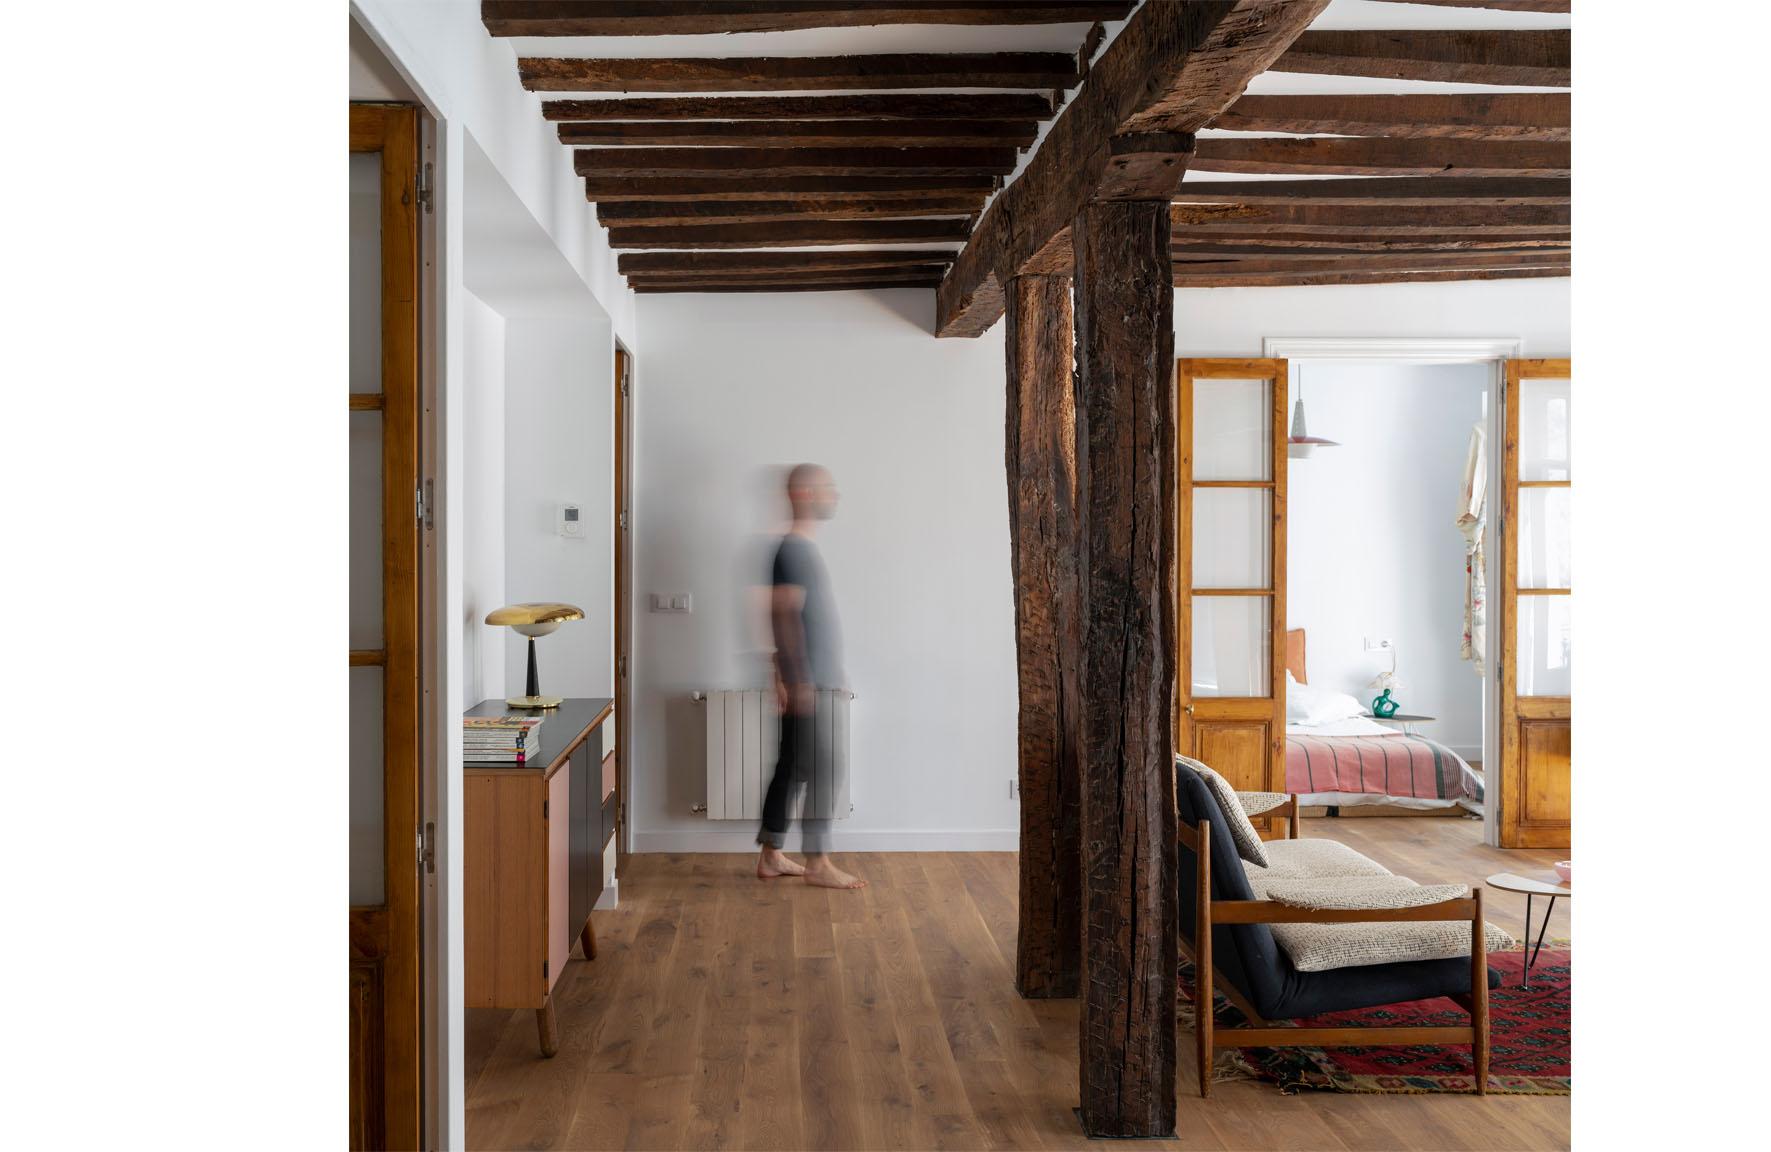 Apartment Esperanza-Bilbao-Image 05.jpg